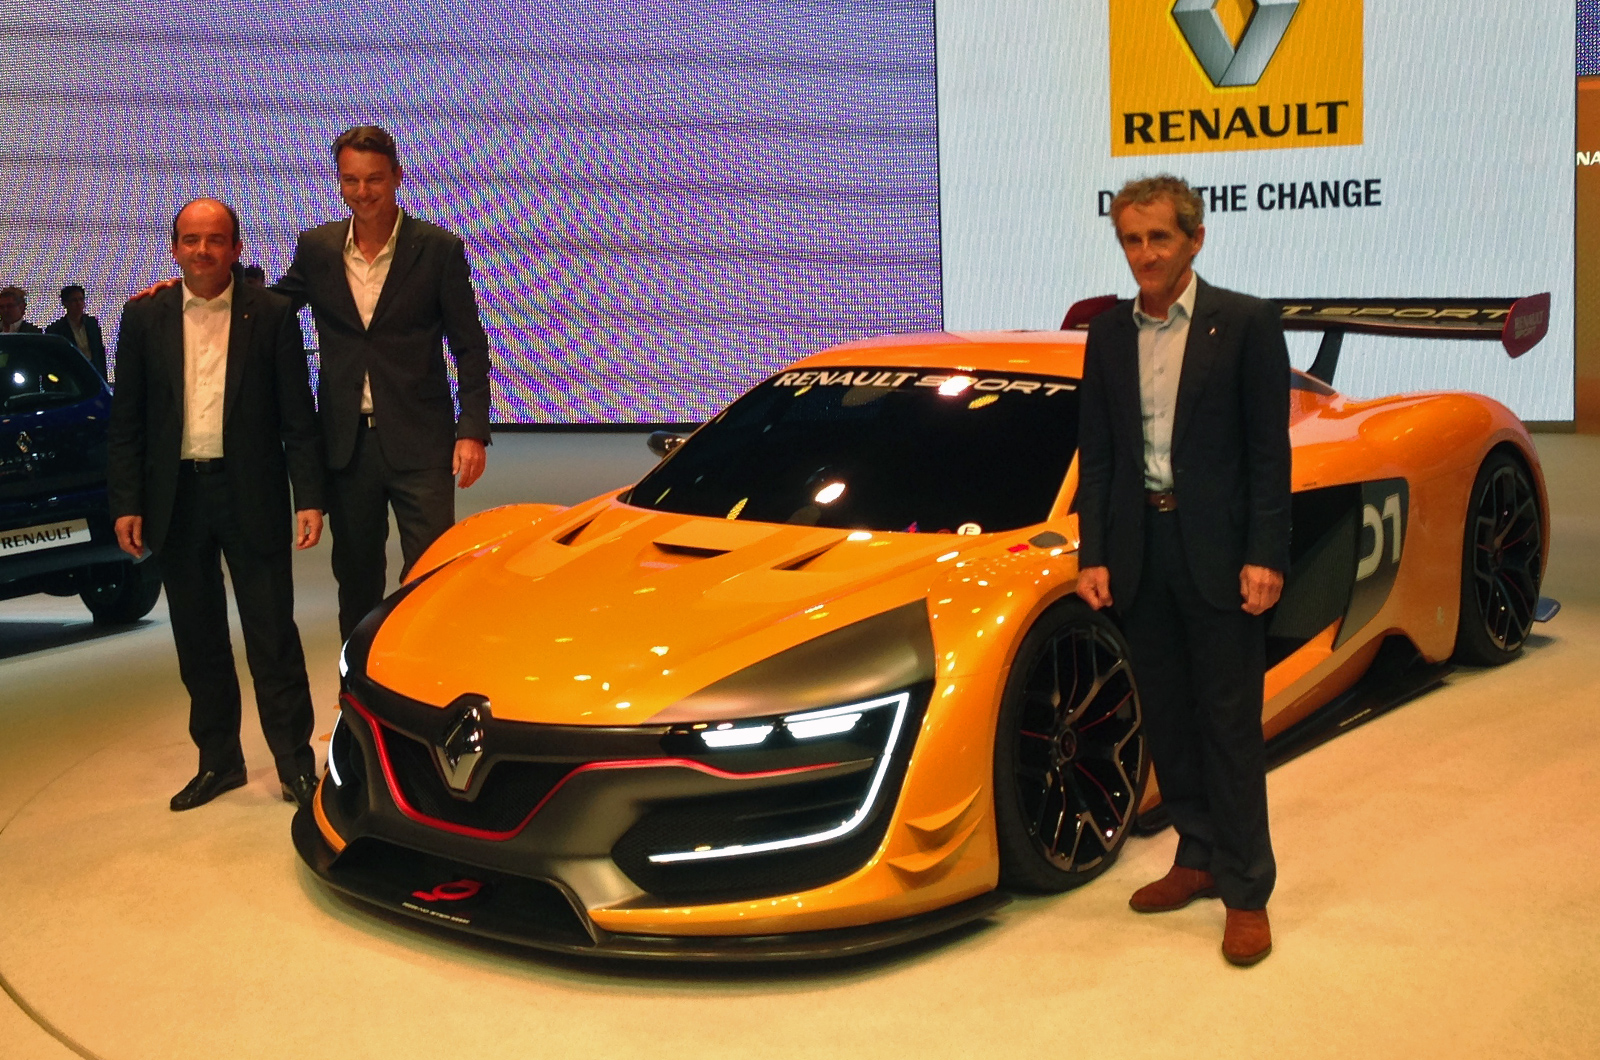 renault reveals new 493bhp racing car. Black Bedroom Furniture Sets. Home Design Ideas